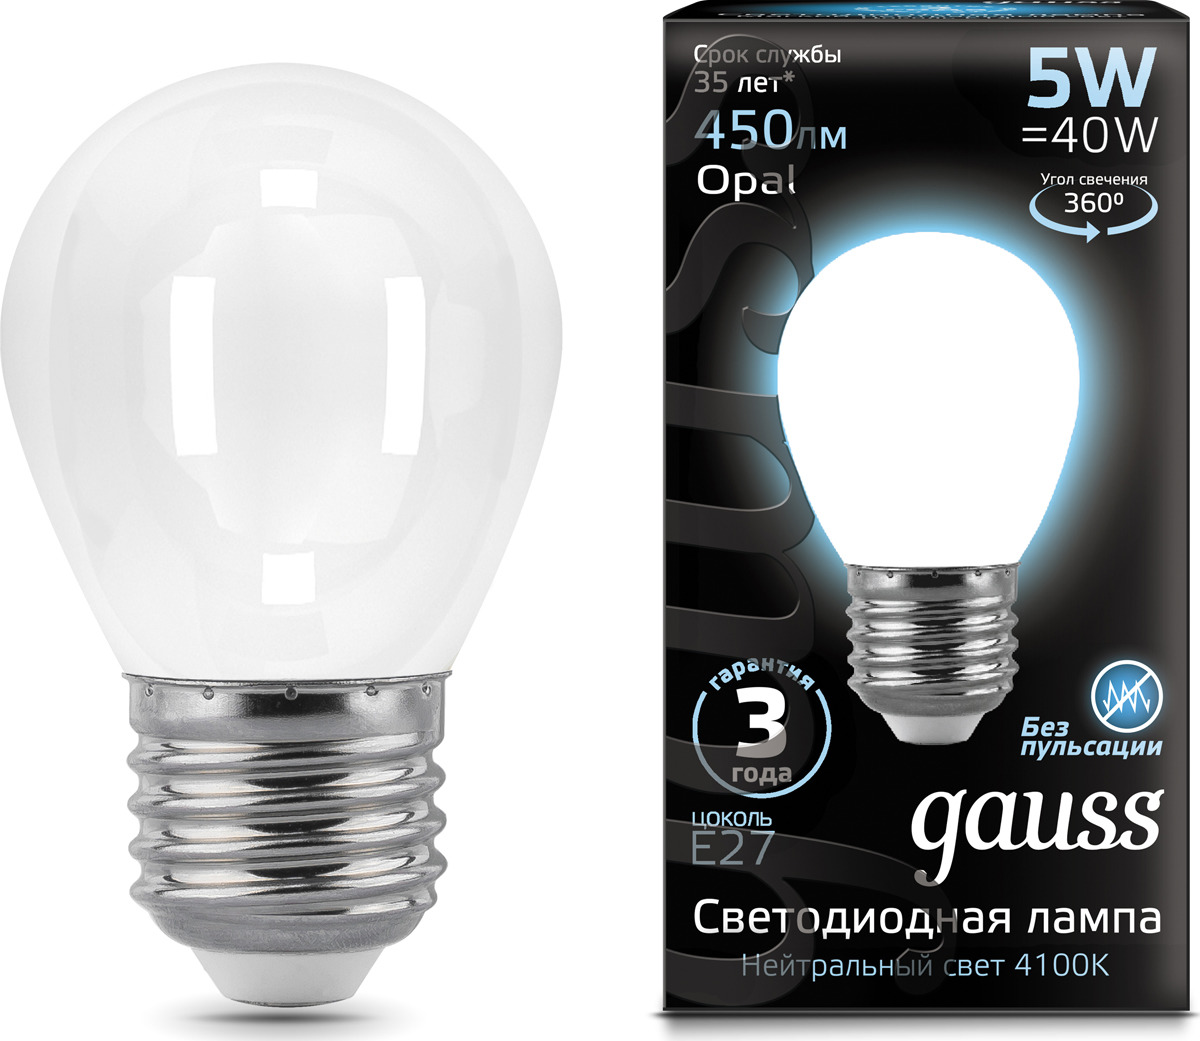 Лампочка Gauss Black Filament Opal LED, шар, E27, 5W.  105202205 Gauss